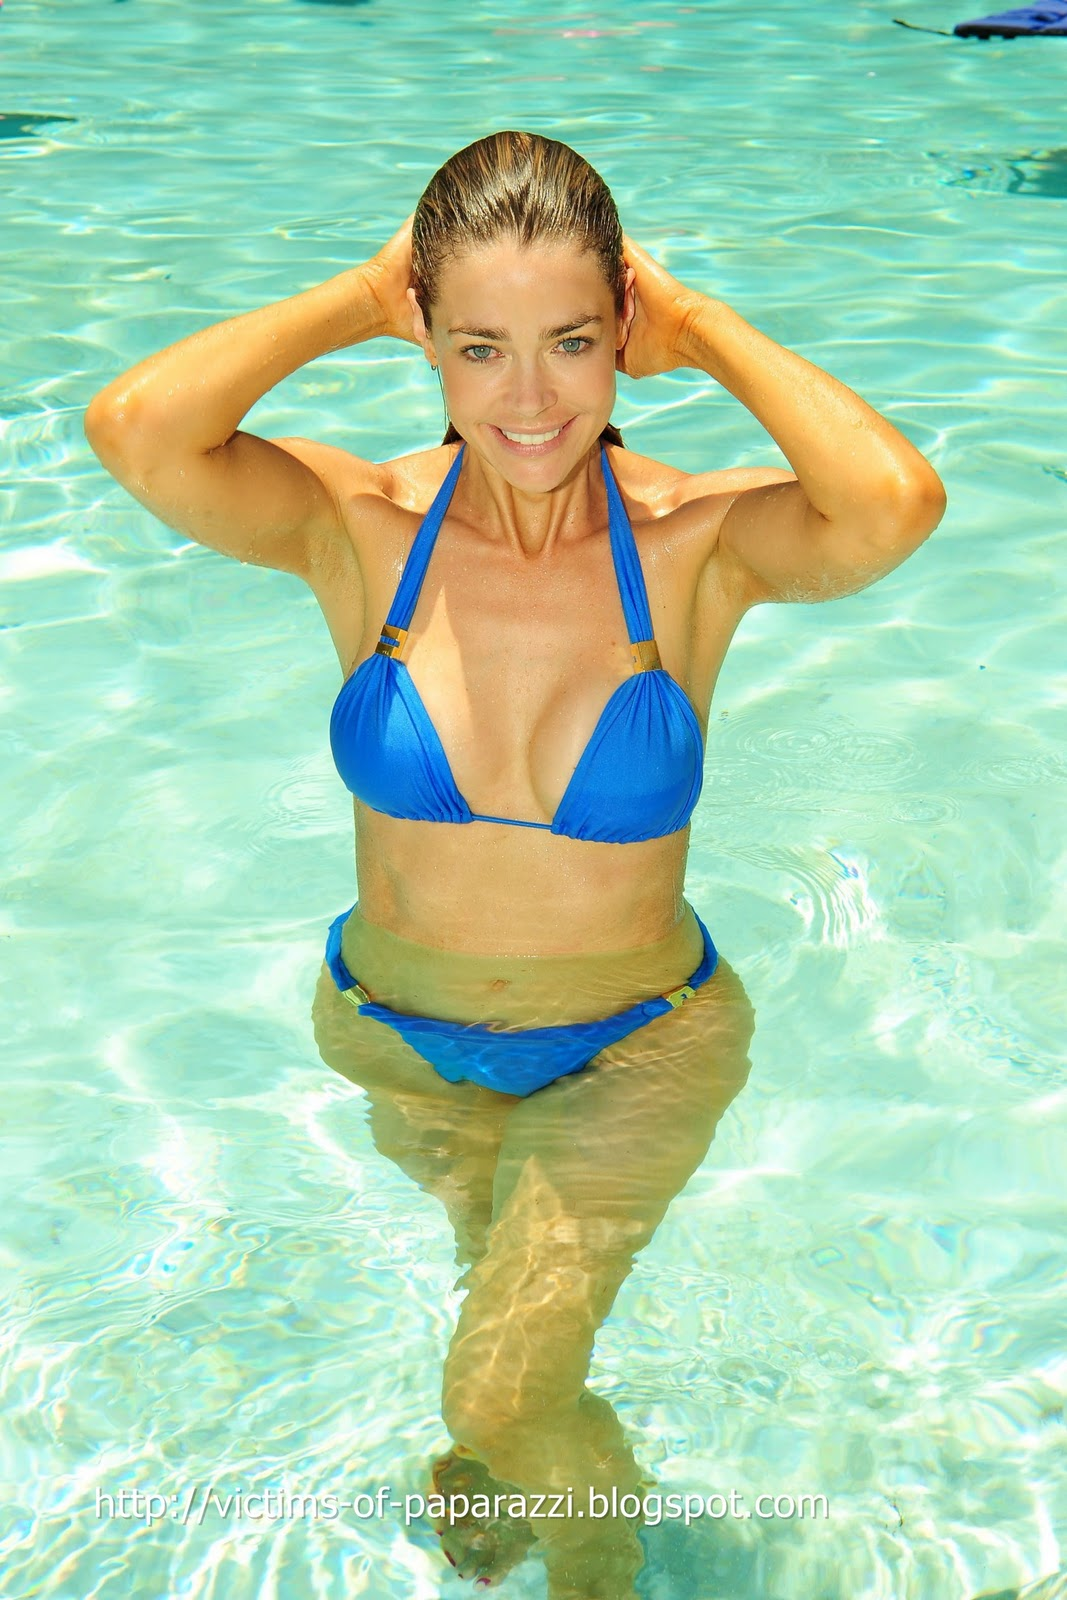 http://1.bp.blogspot.com/_NFcDSk31Yq8/TM_cn5R8f1I/AAAAAAAAAV0/1Ks8UjBZKAo/s1600/Denise+Richards+blue+bikini+1.jpg